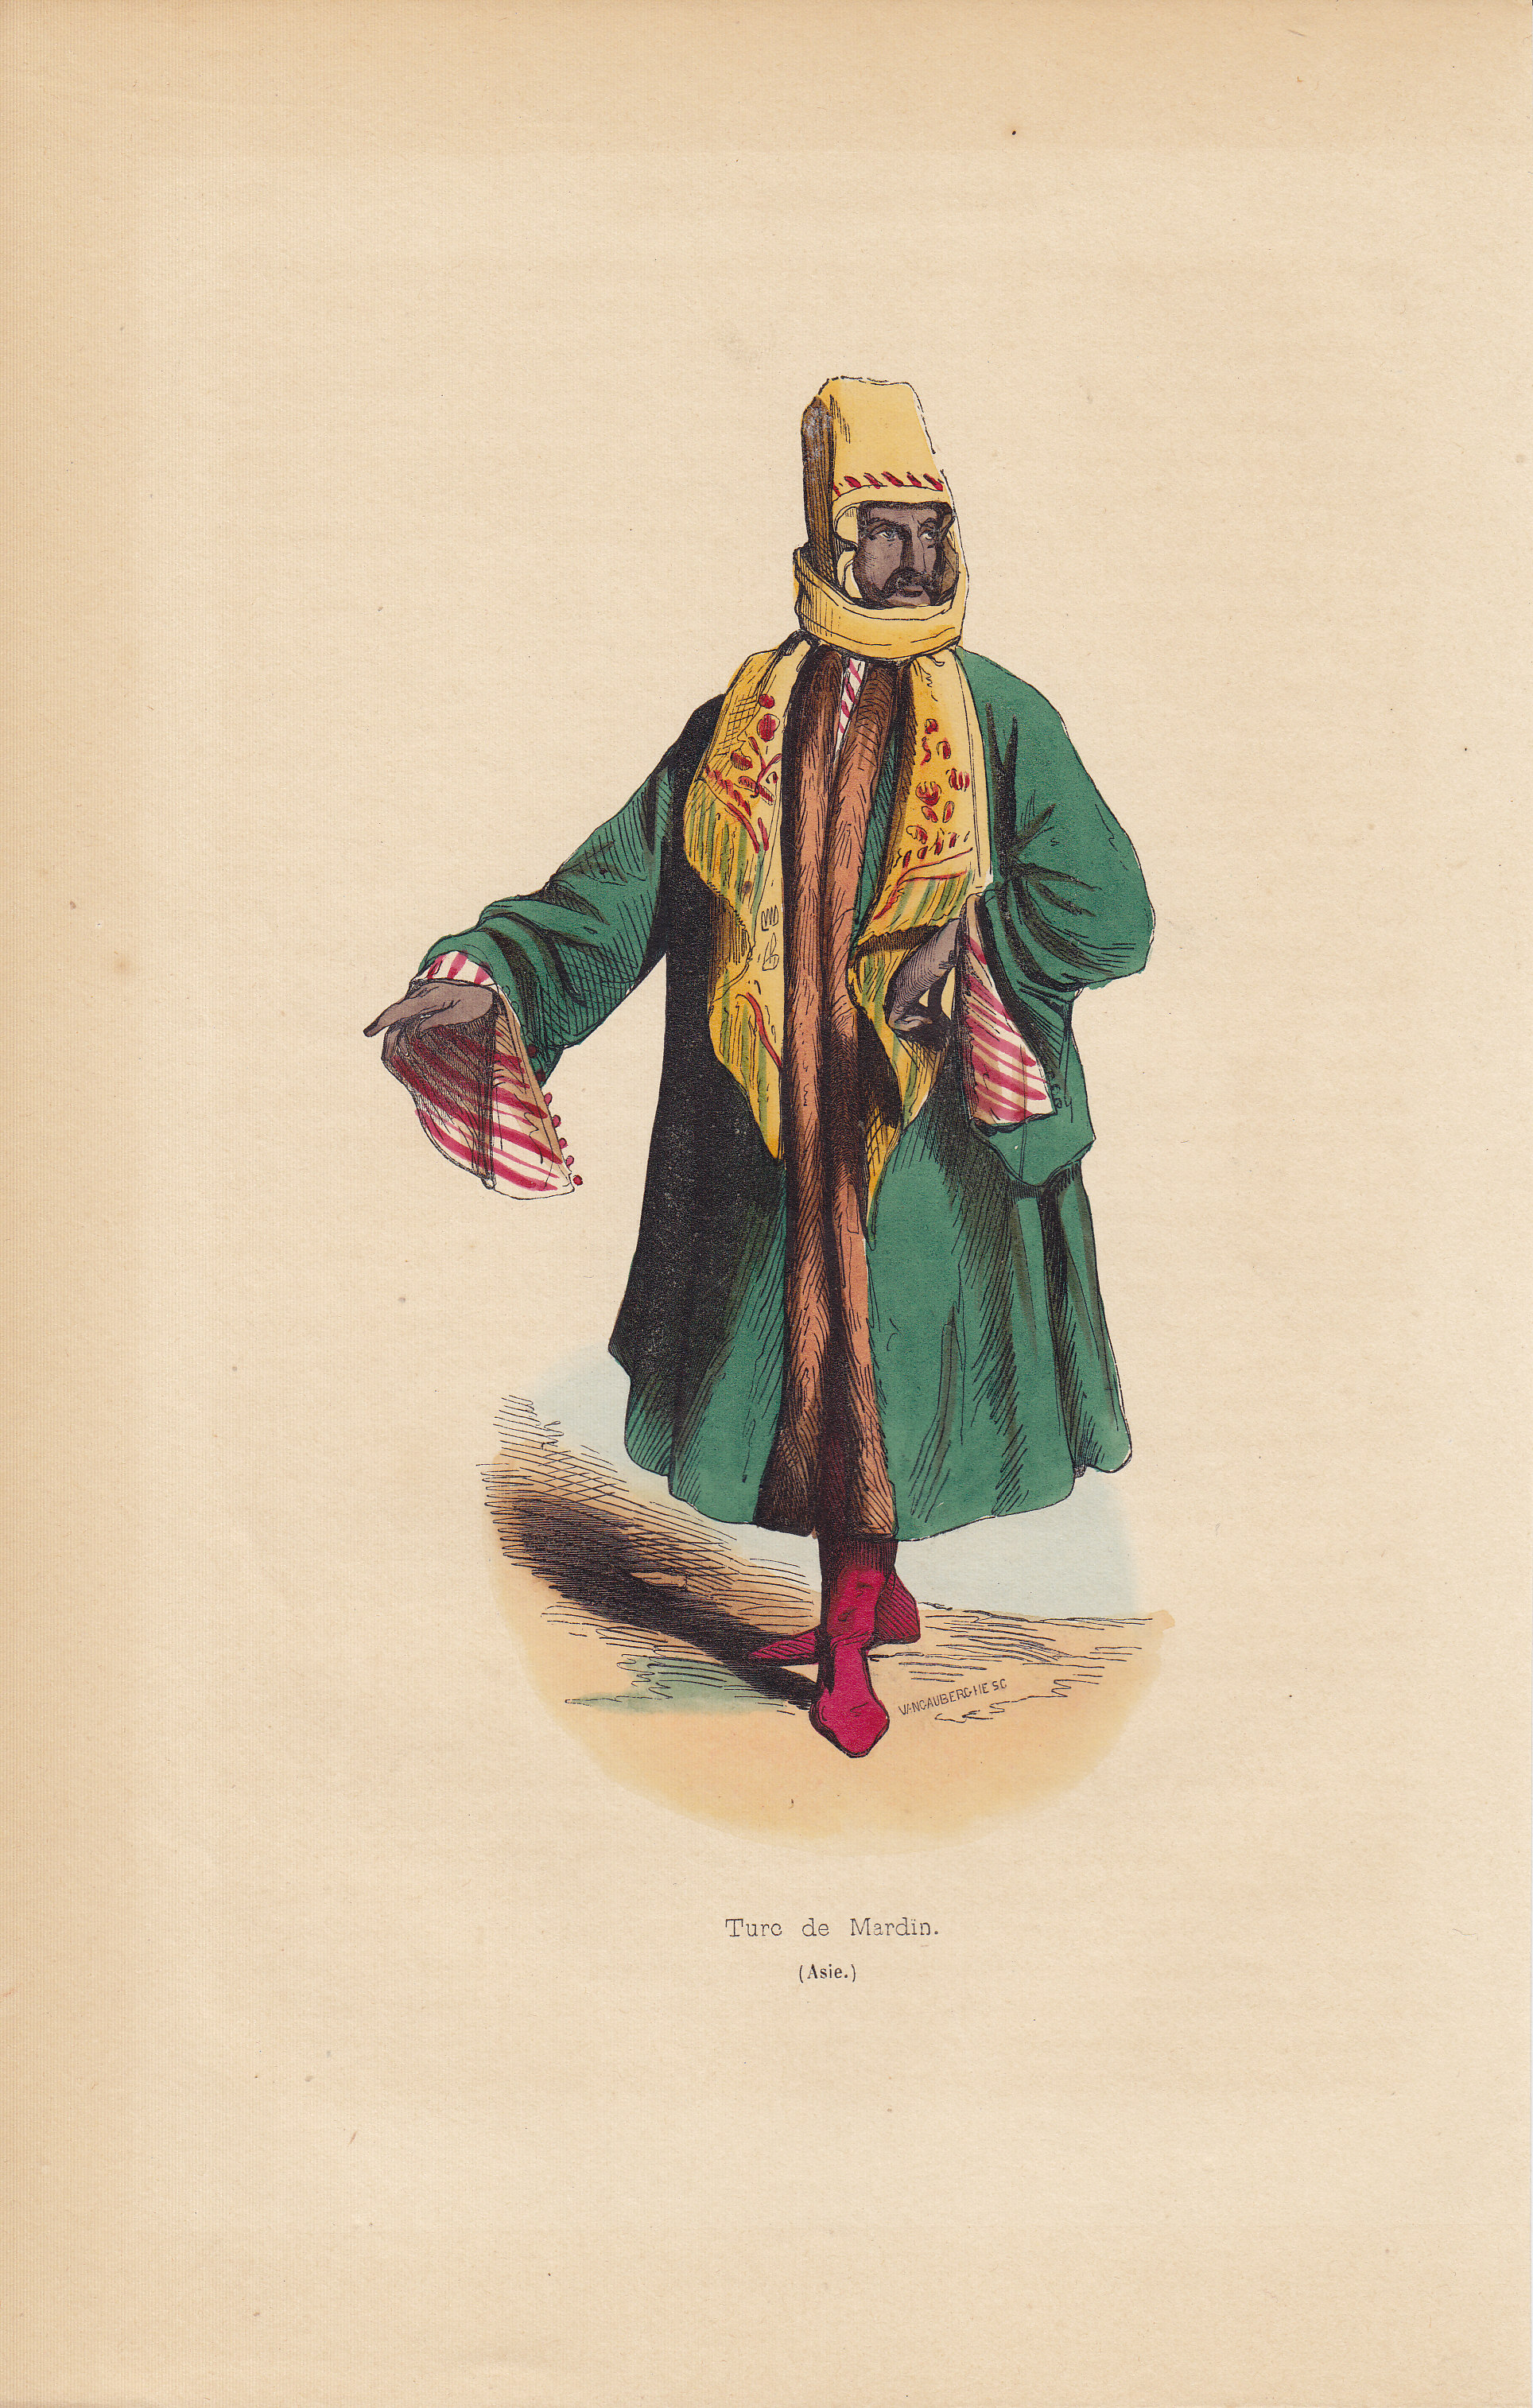 Turc De Mardin